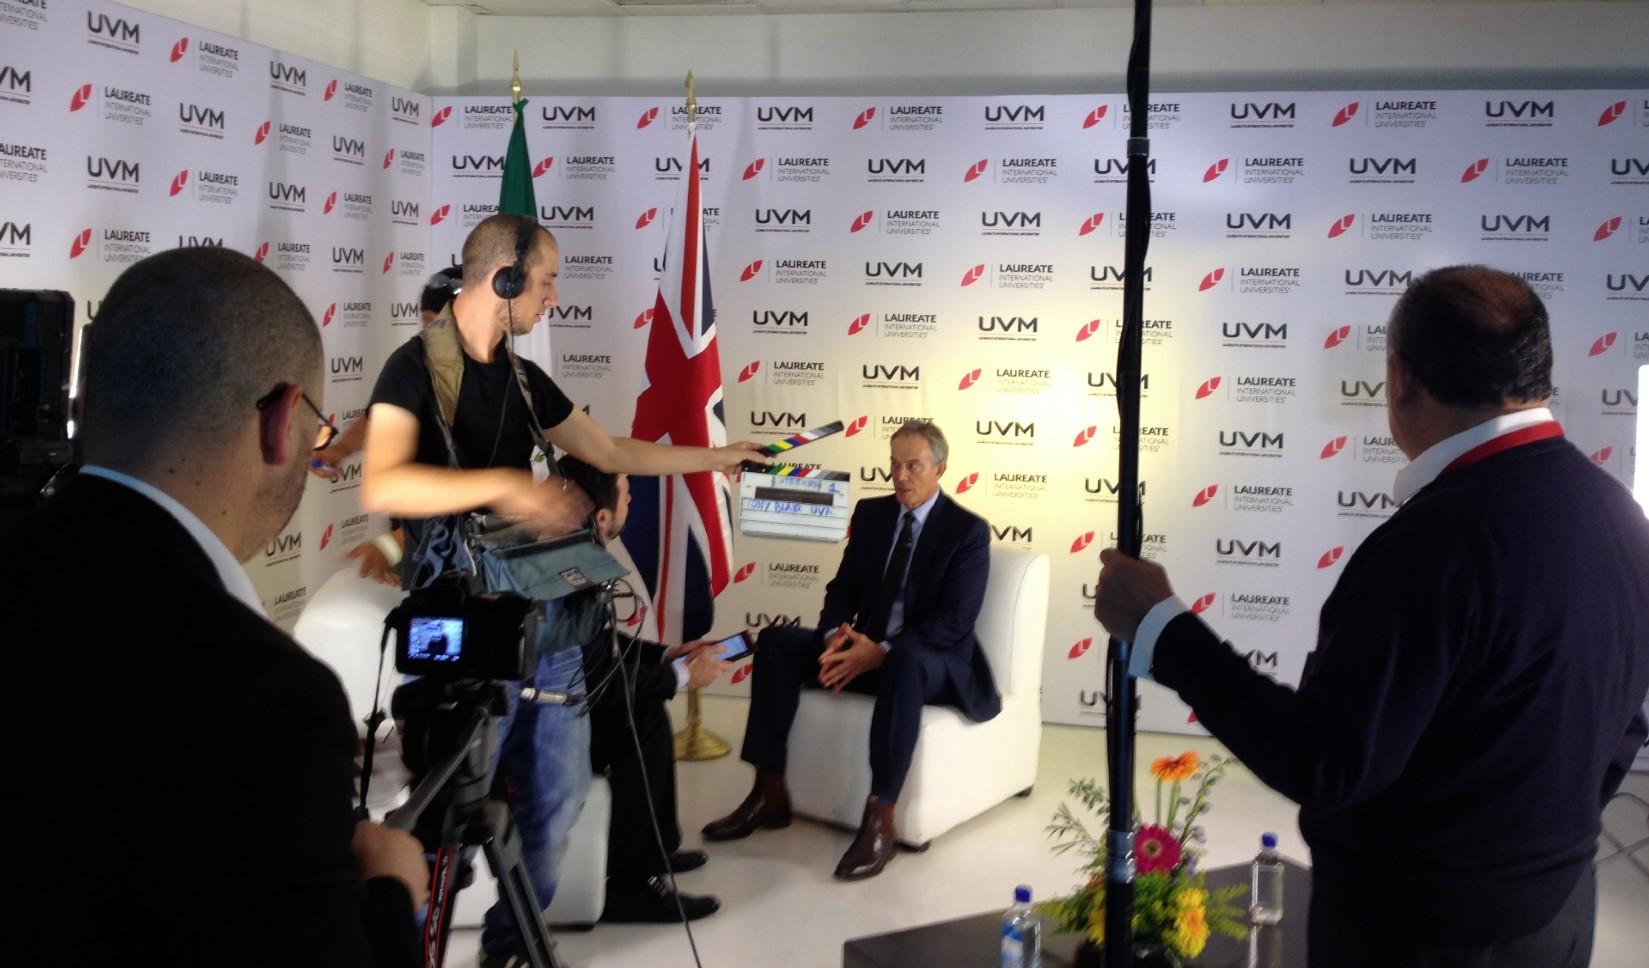 Entrevista Ex Primer Ministro Reino Unido Tony Blair